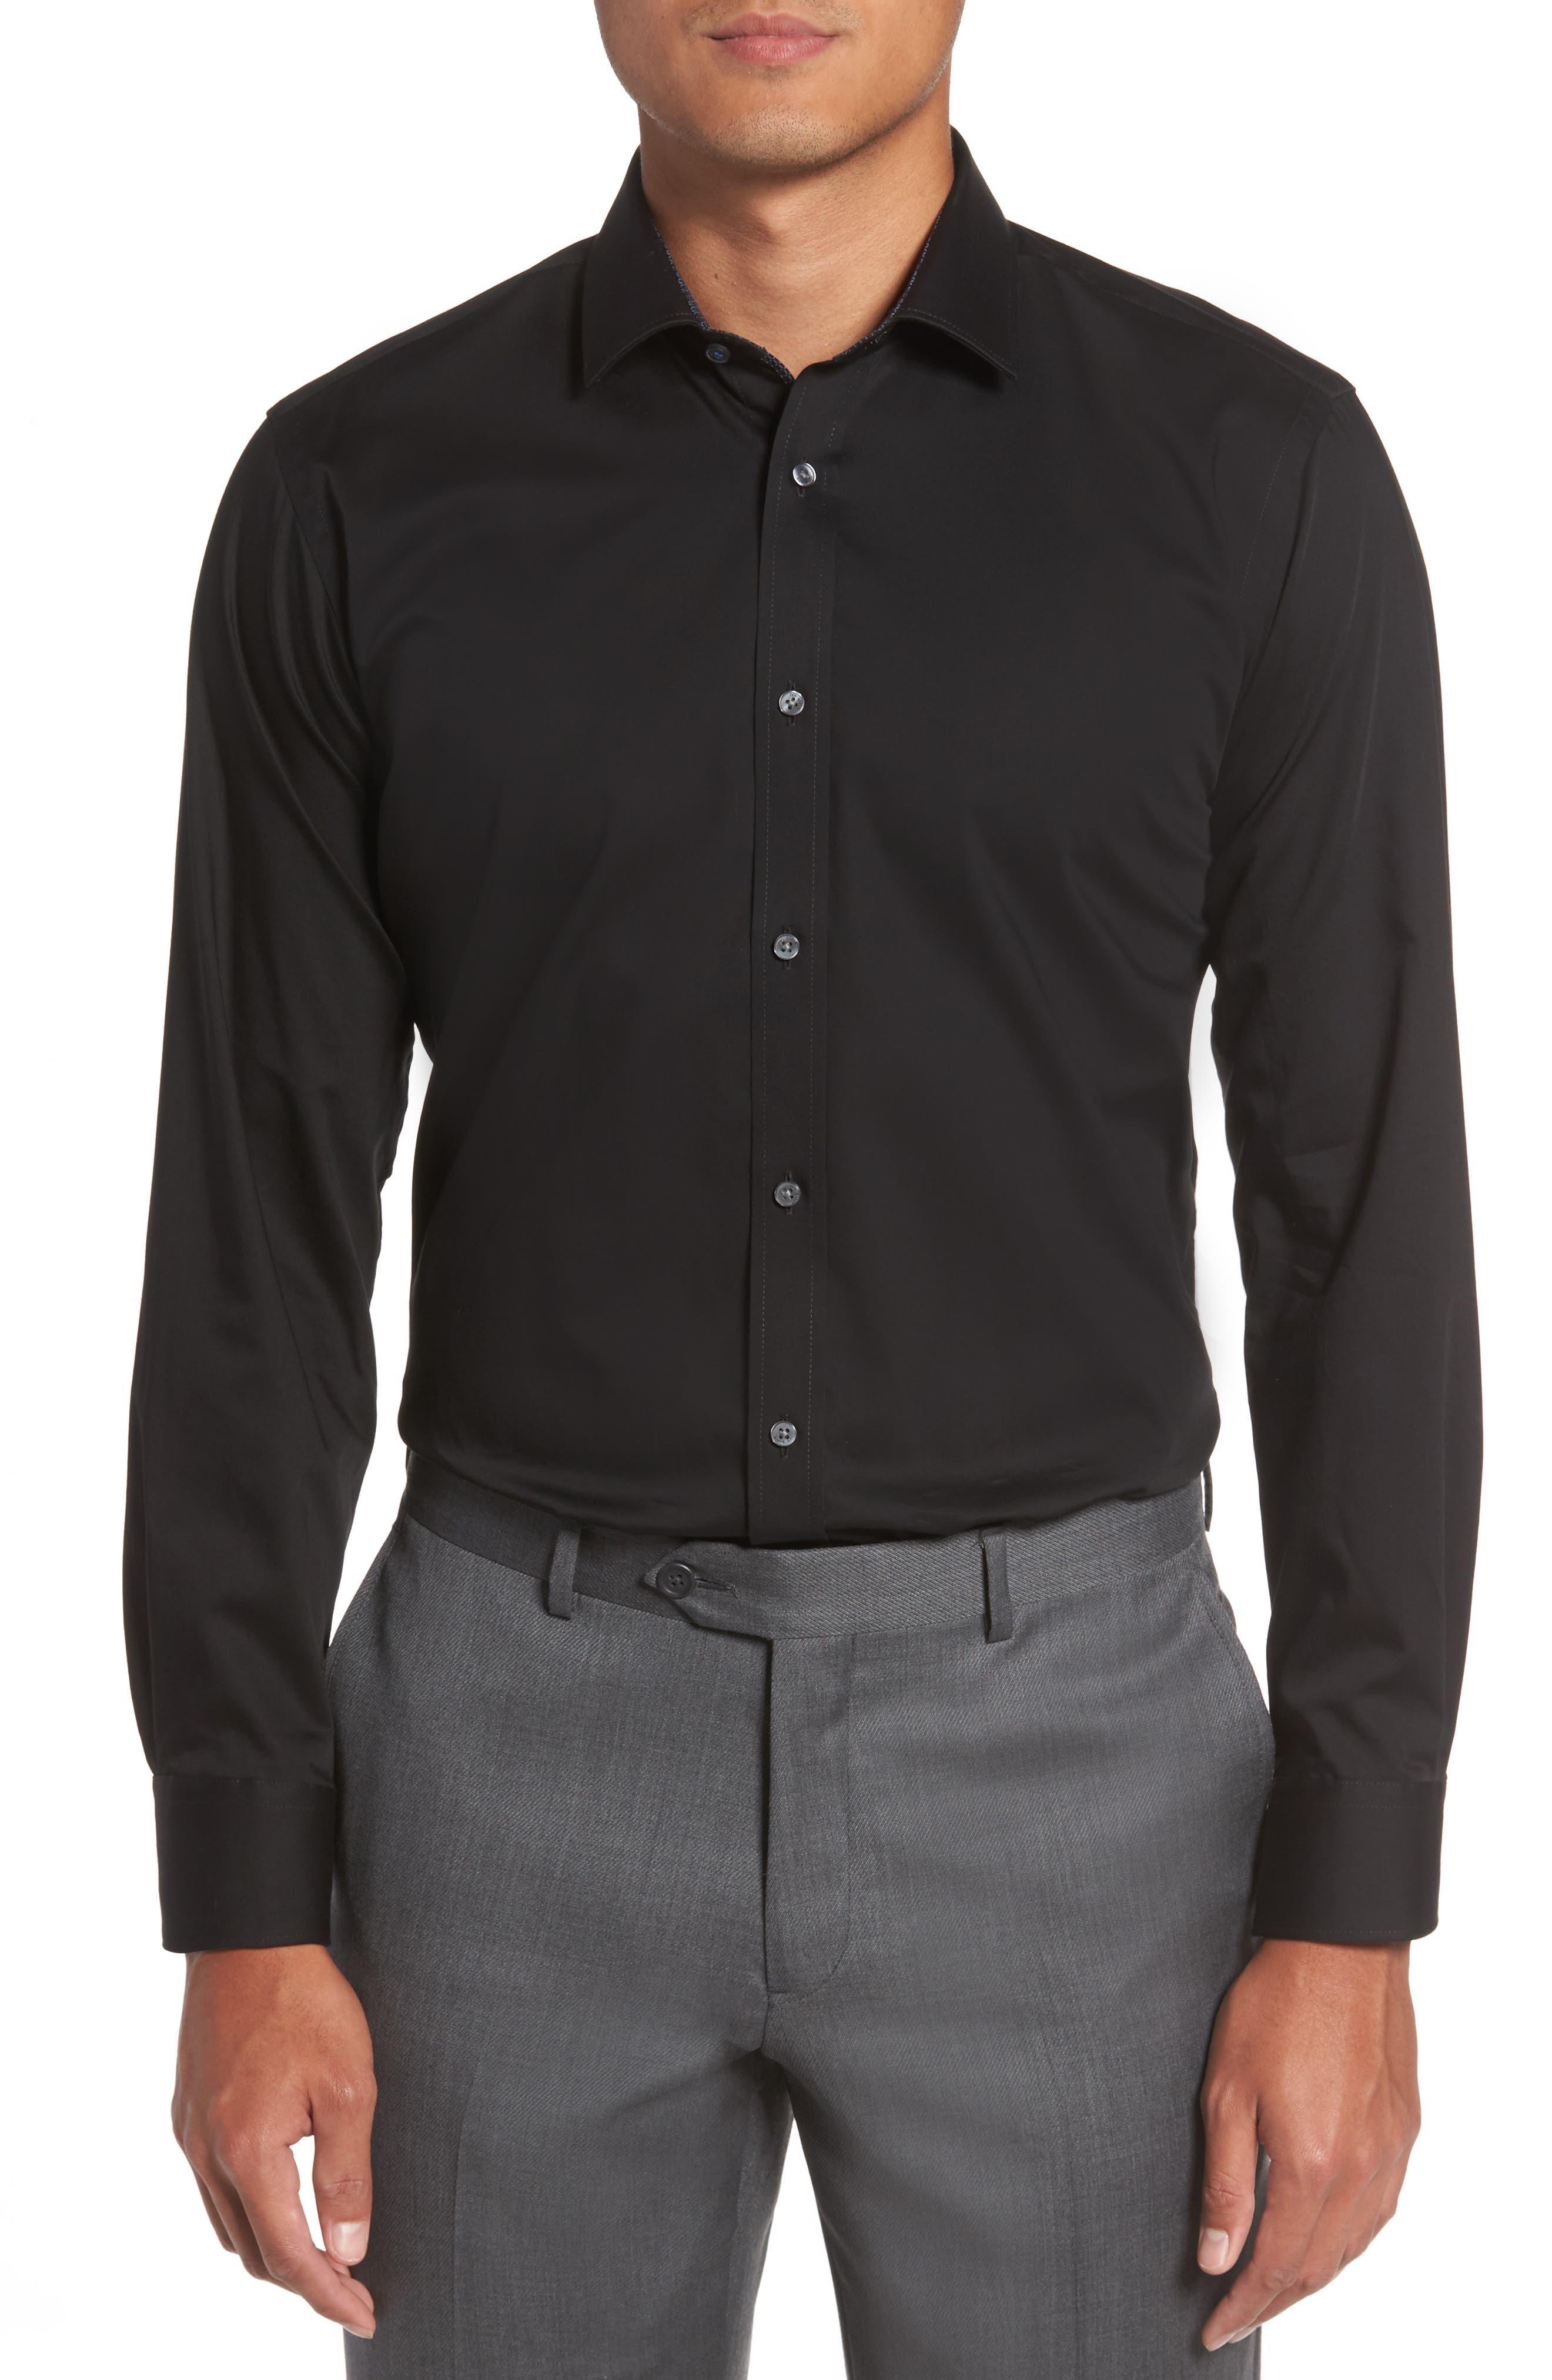 Caramor Trim Fit Solid Dress Shirt,                             Main thumbnail 1, color,                             BLACK